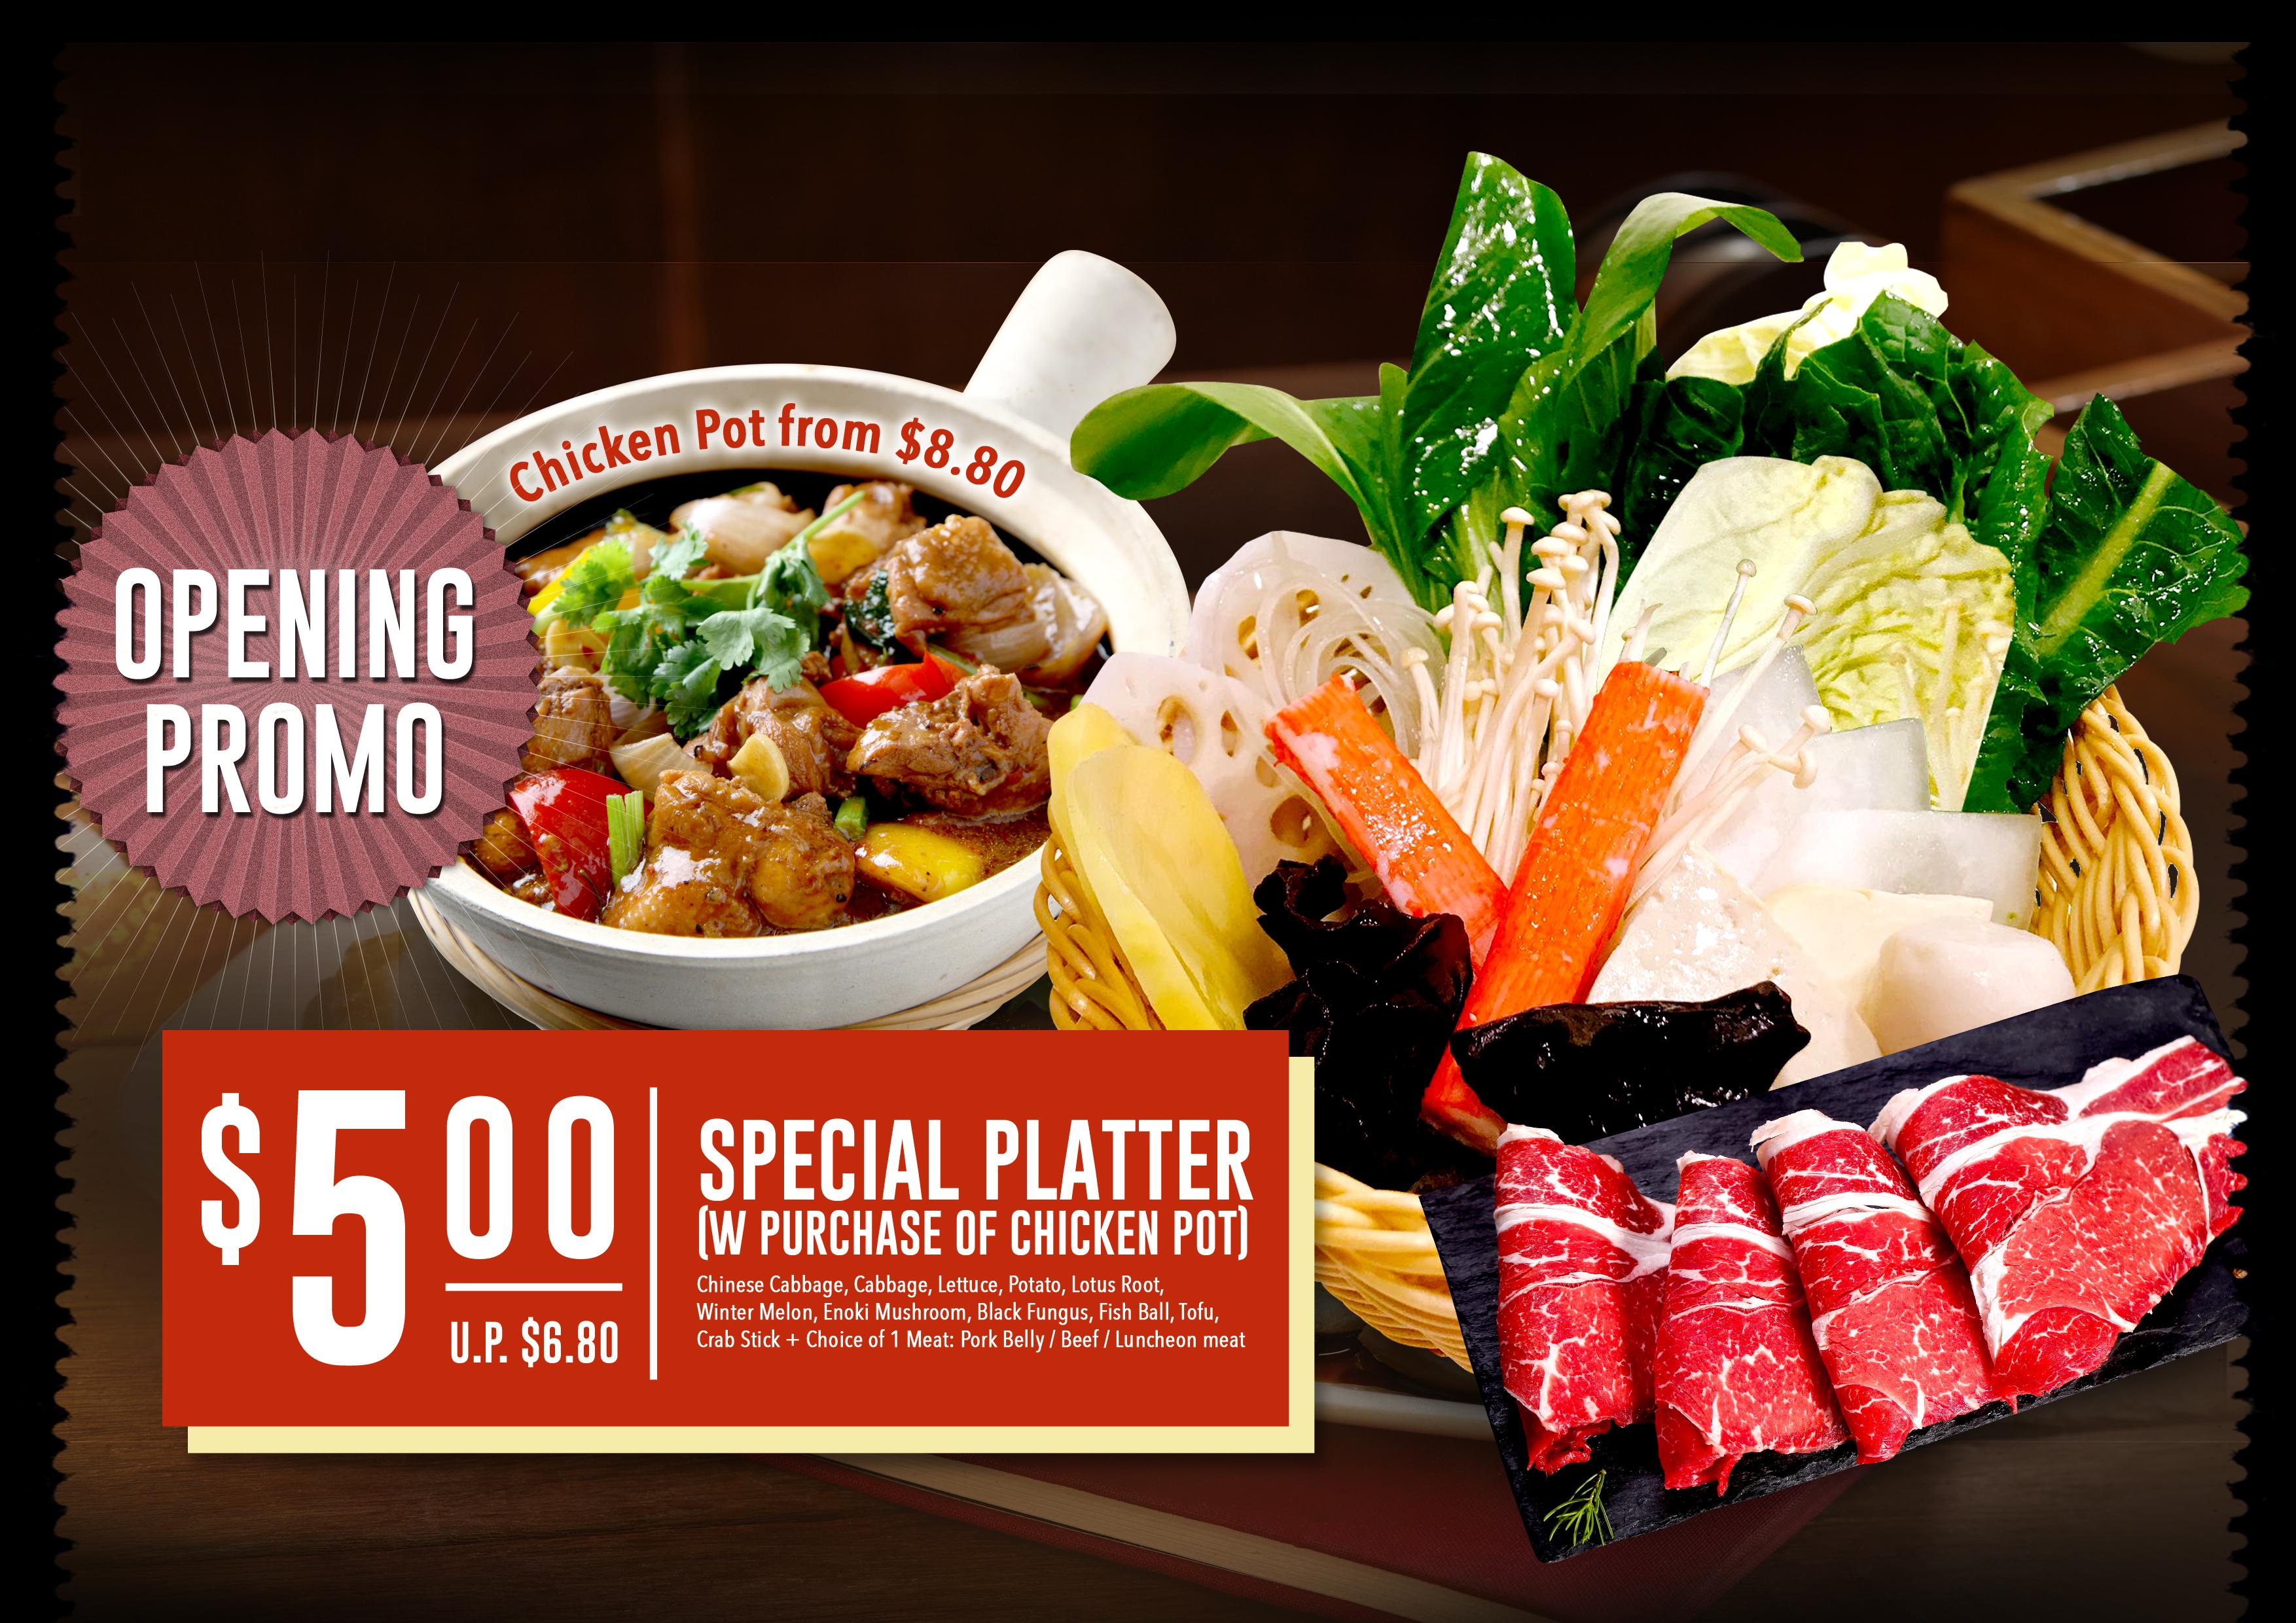 Divine Chicken Pot Special Platter